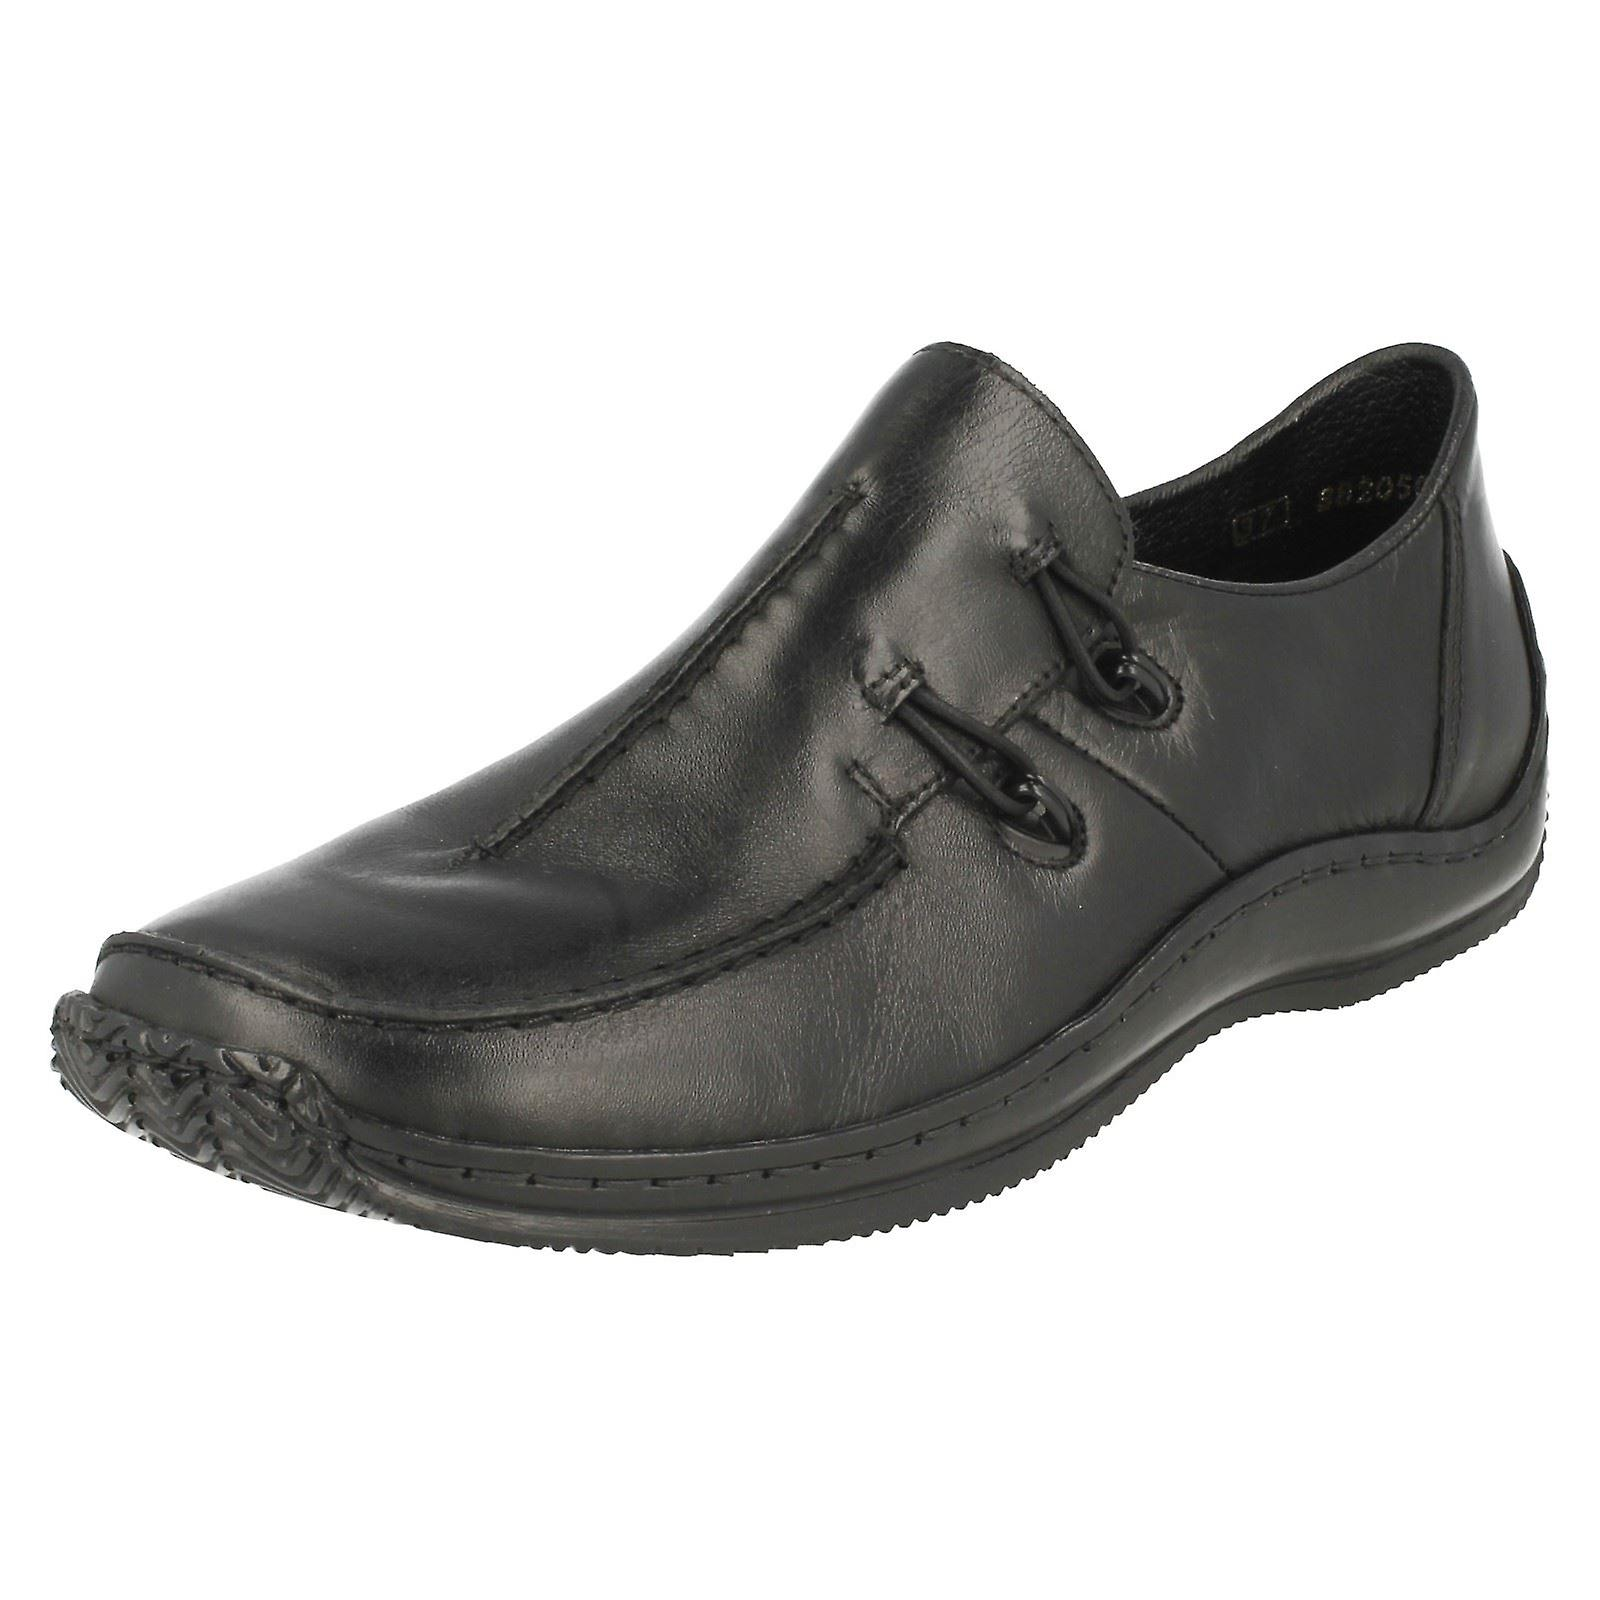 Buty damskie Rieker płaskim L1751 jKzxb